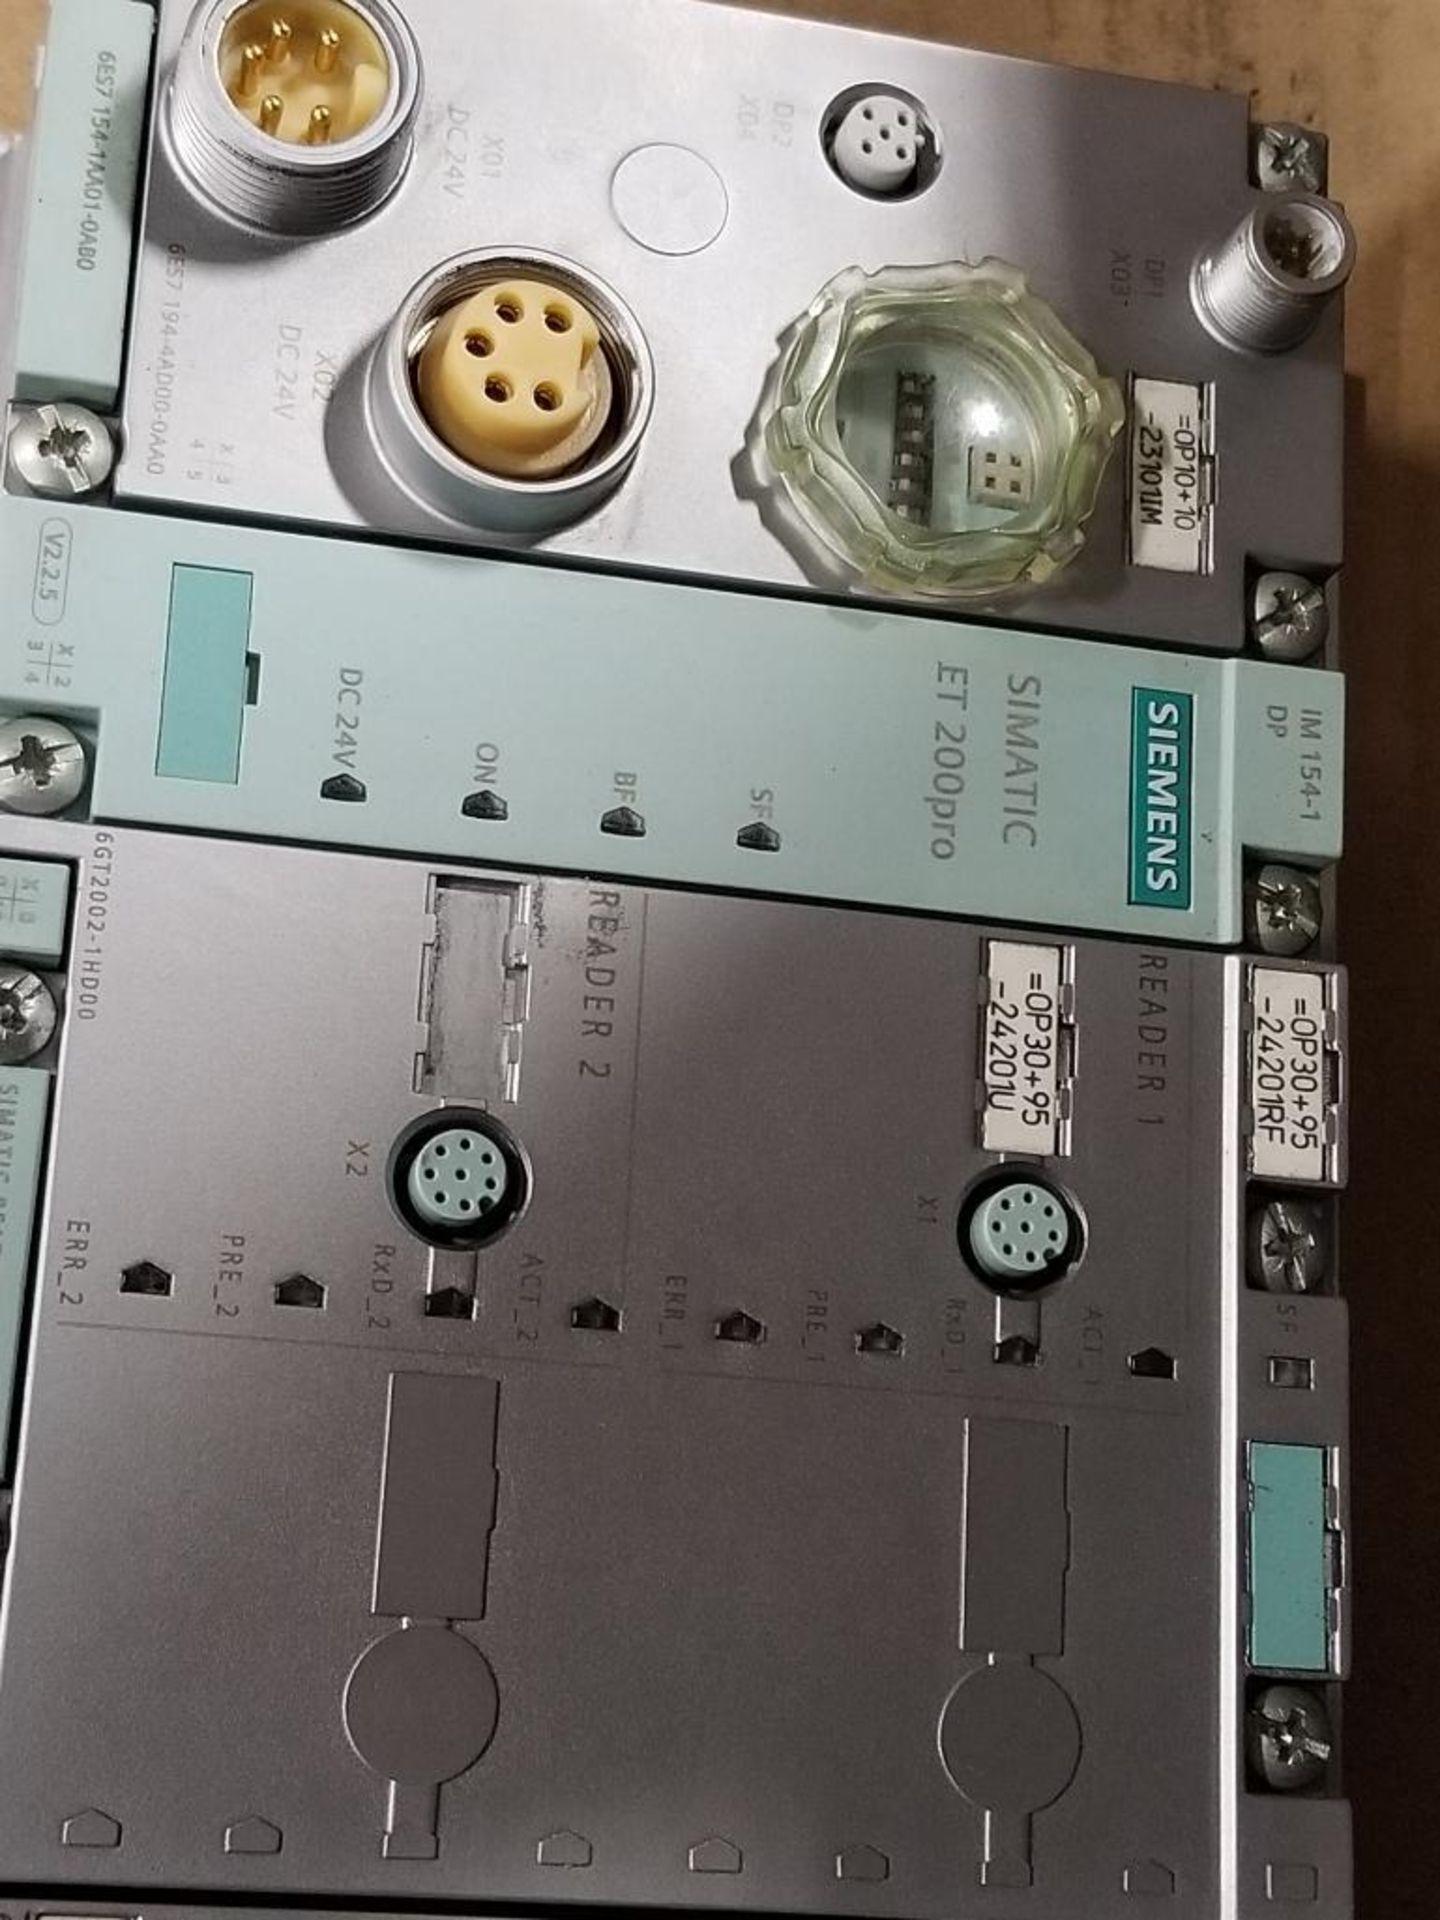 Siemens RSe-ST 3RK1304-5KS40-5AA3 Reversing starter and flow control line. - Image 6 of 6